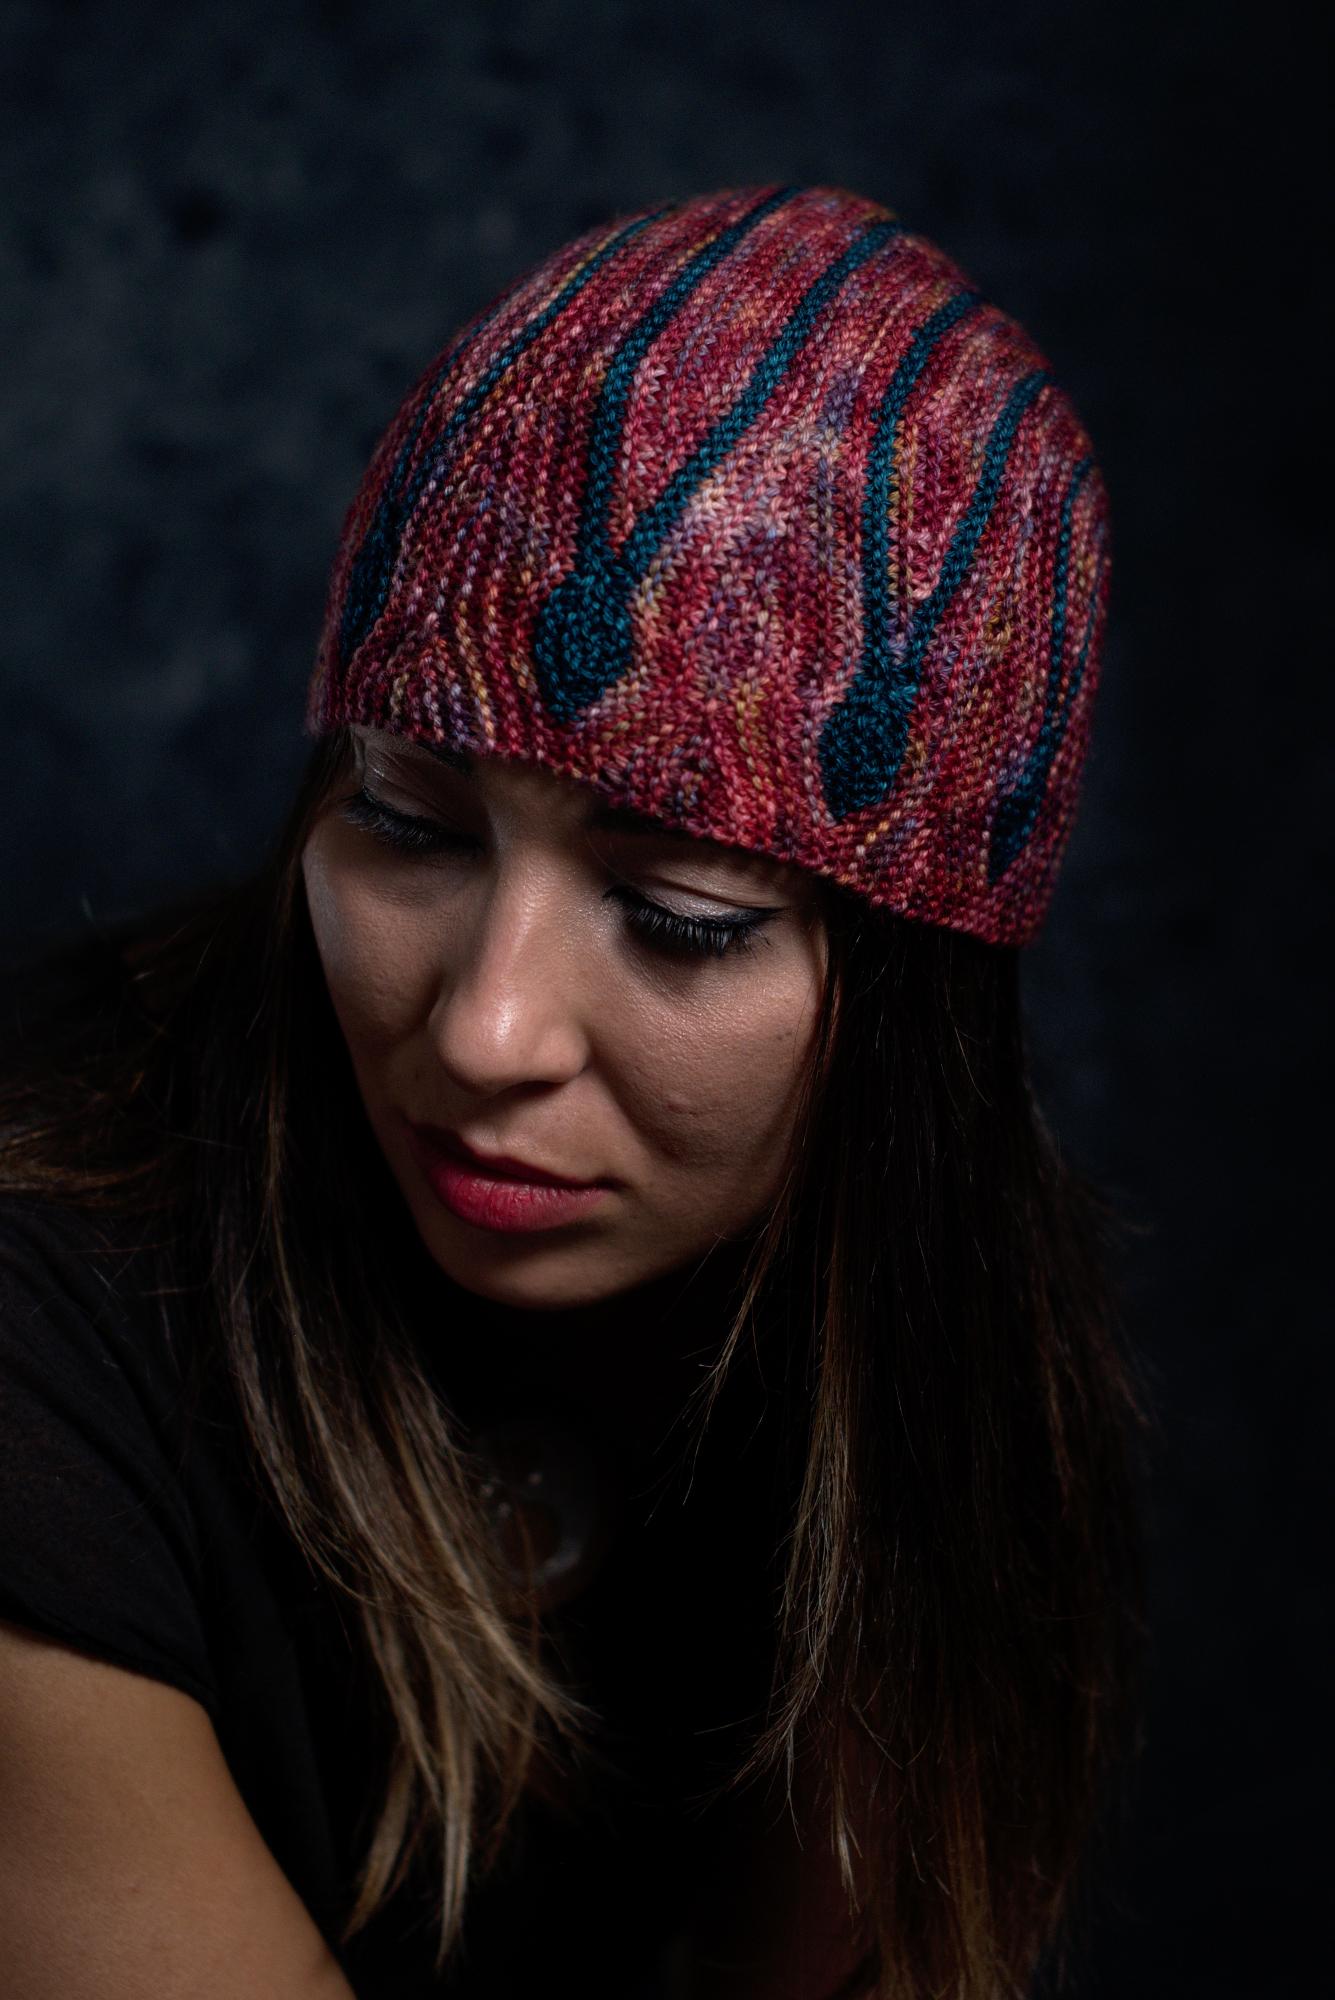 Oscillare sideways knit short row hat knitting pattern